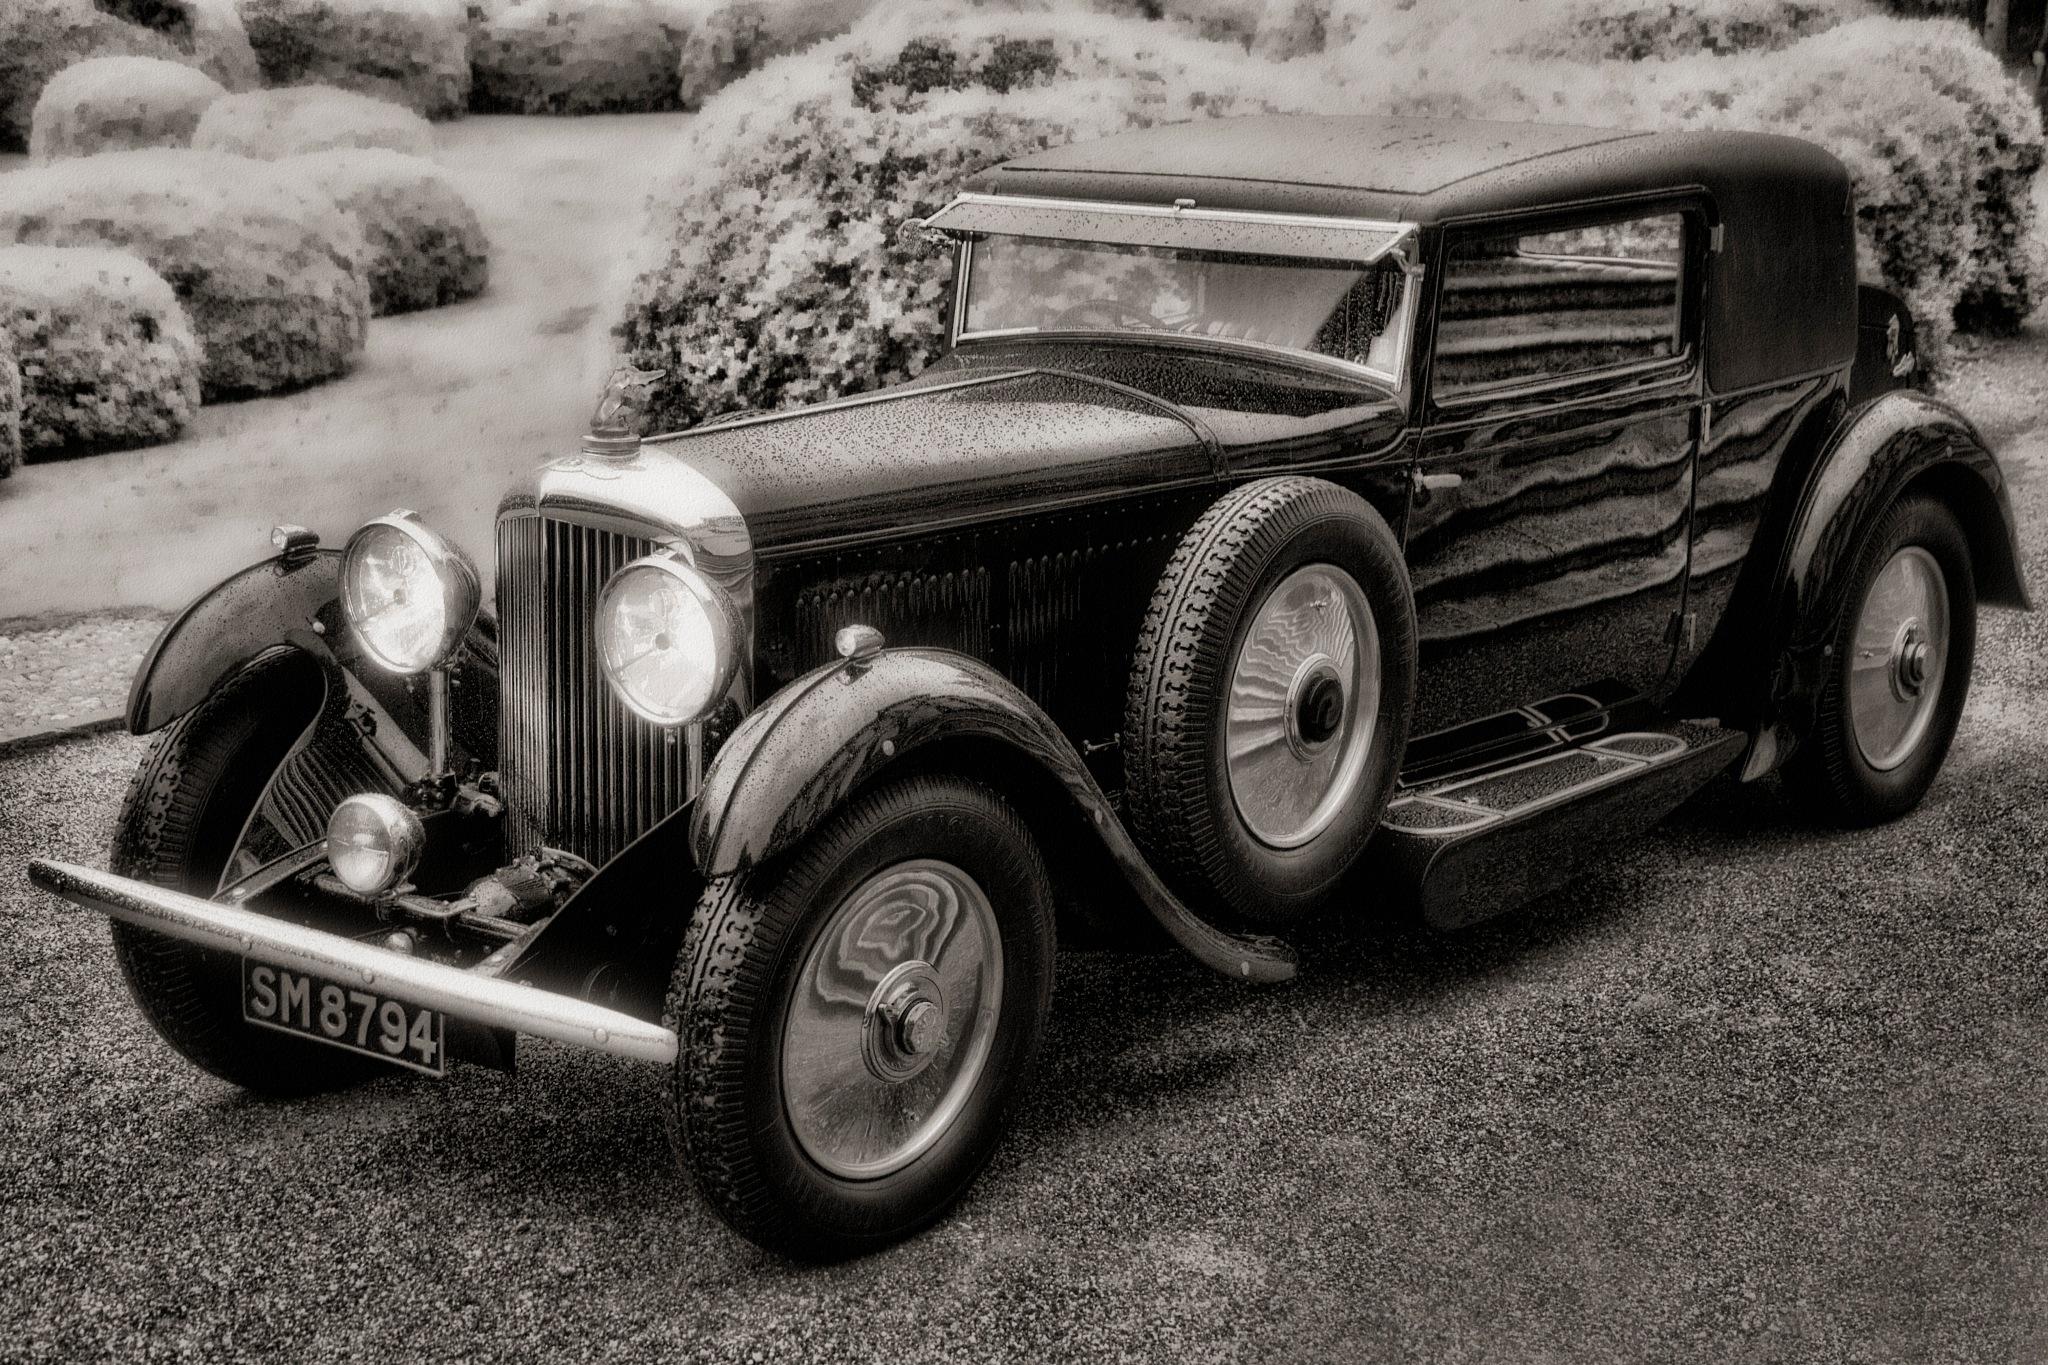 Bentley 8 Litre Sportsman Coupé (1931) by DuschanTomic